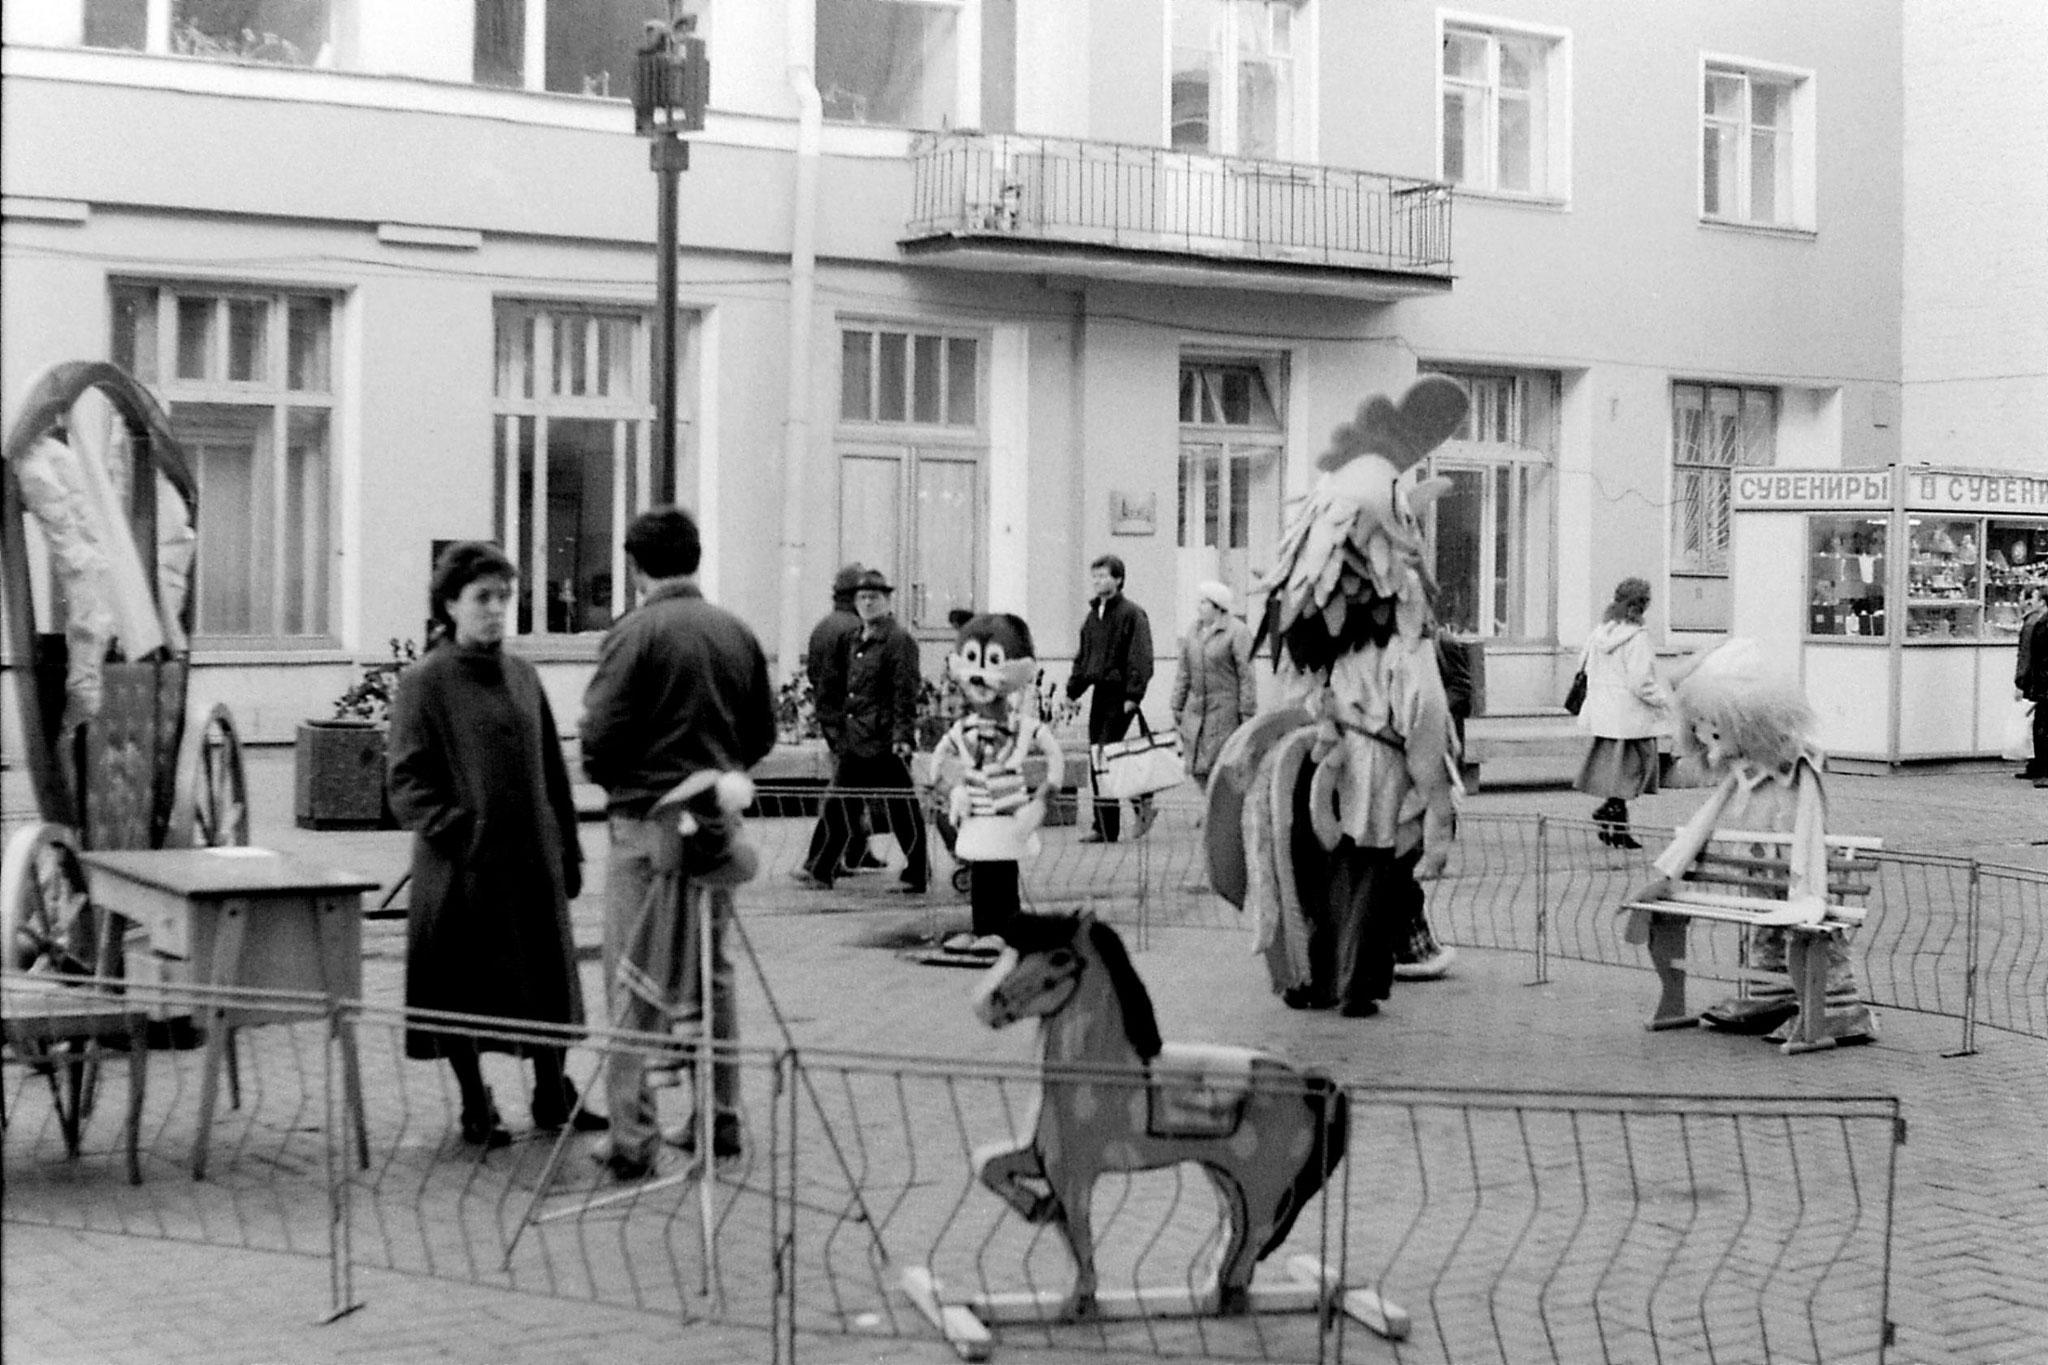 18/10/1988: 15: Children's photographer